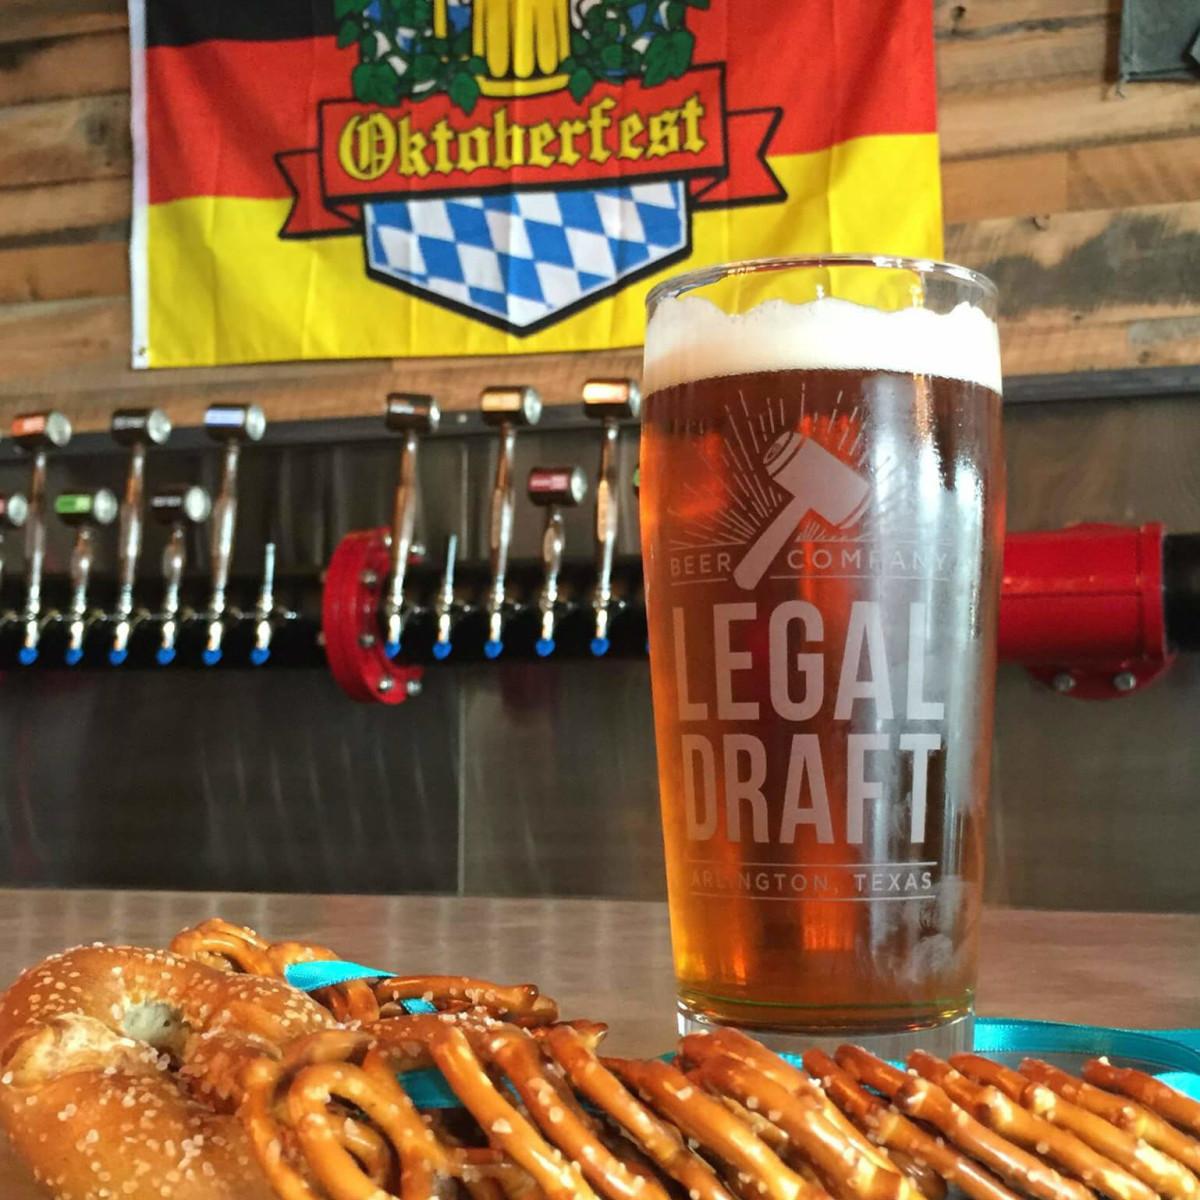 Legal Draft Beer Co. Lawktoberfest